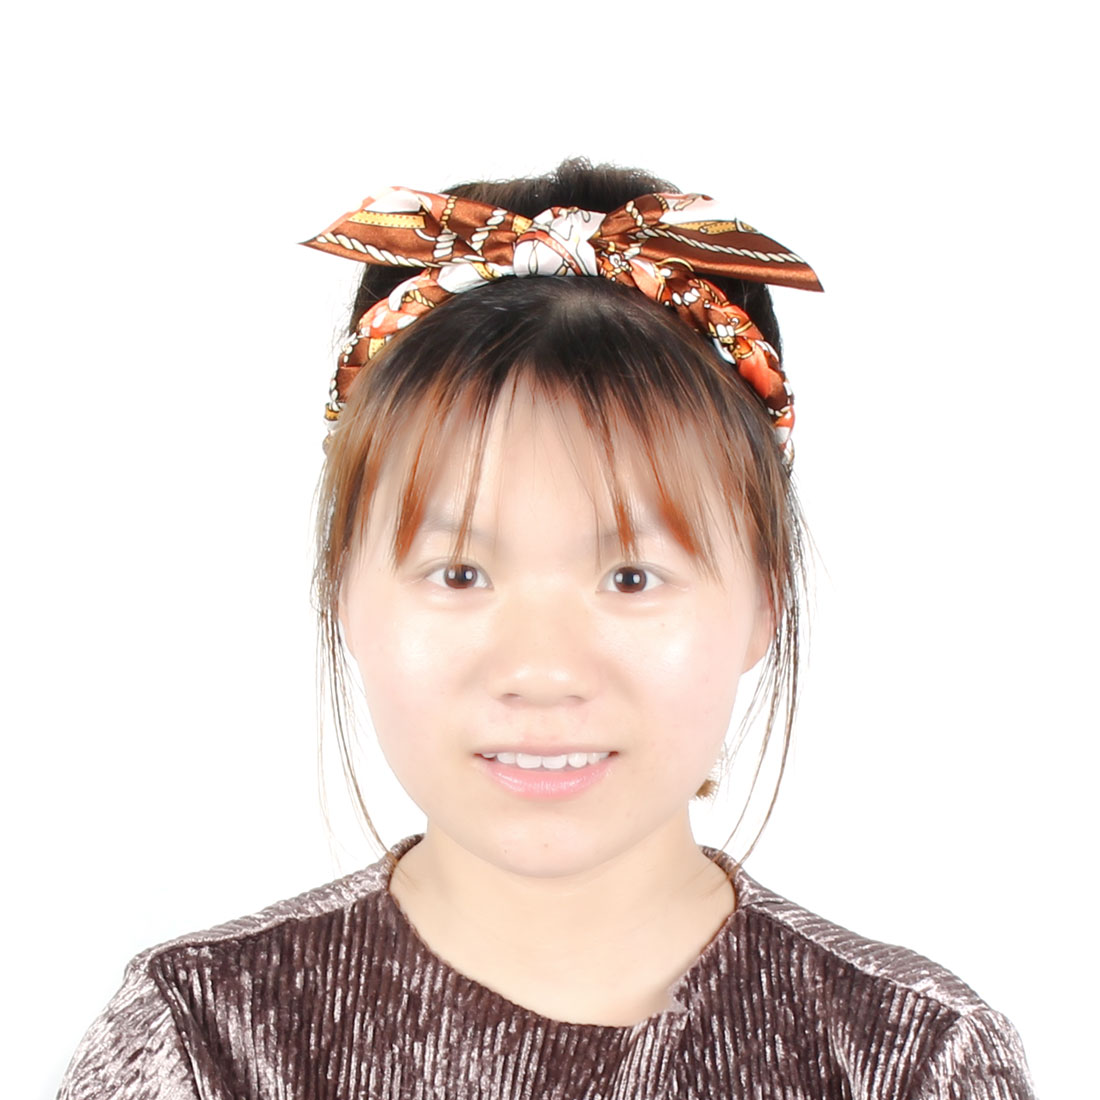 Women Polyester Braided Pigtails Design imitated rabbit Ears Headband Hair Band Orange